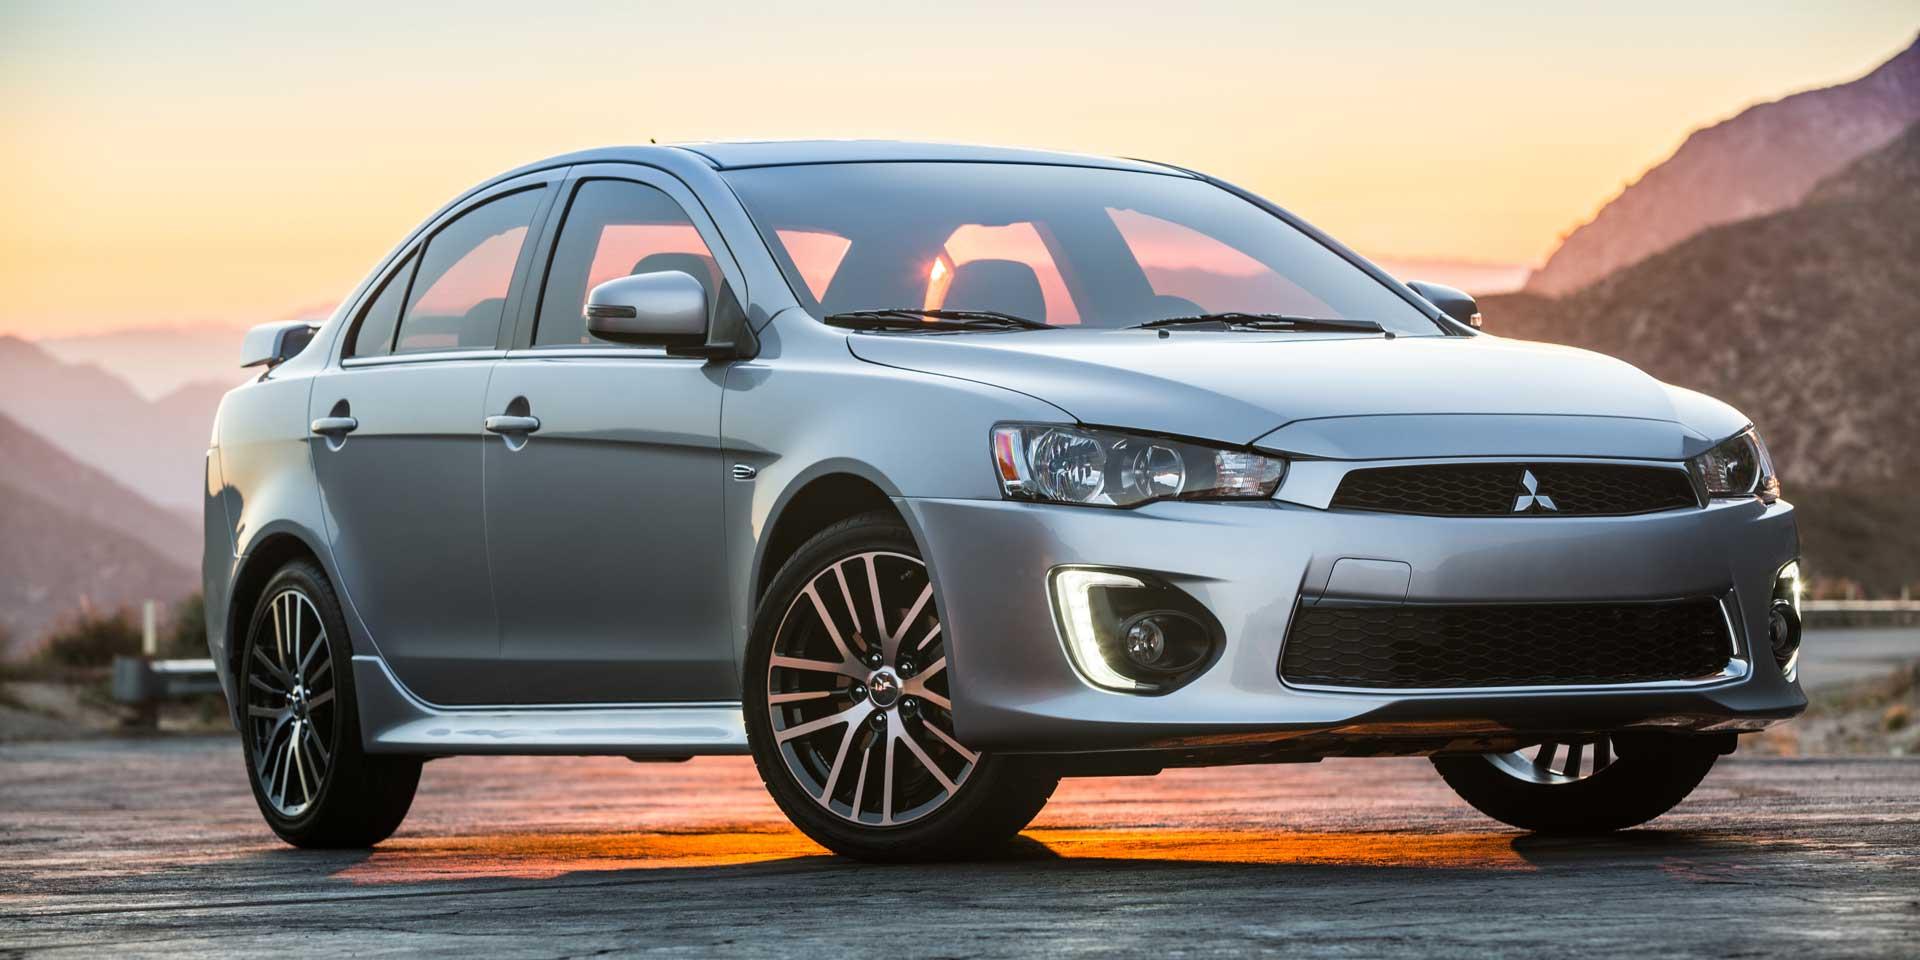 https://www.drivechicago.com/featured/img/2017-Mitsubishi-Lancer-7.jpg